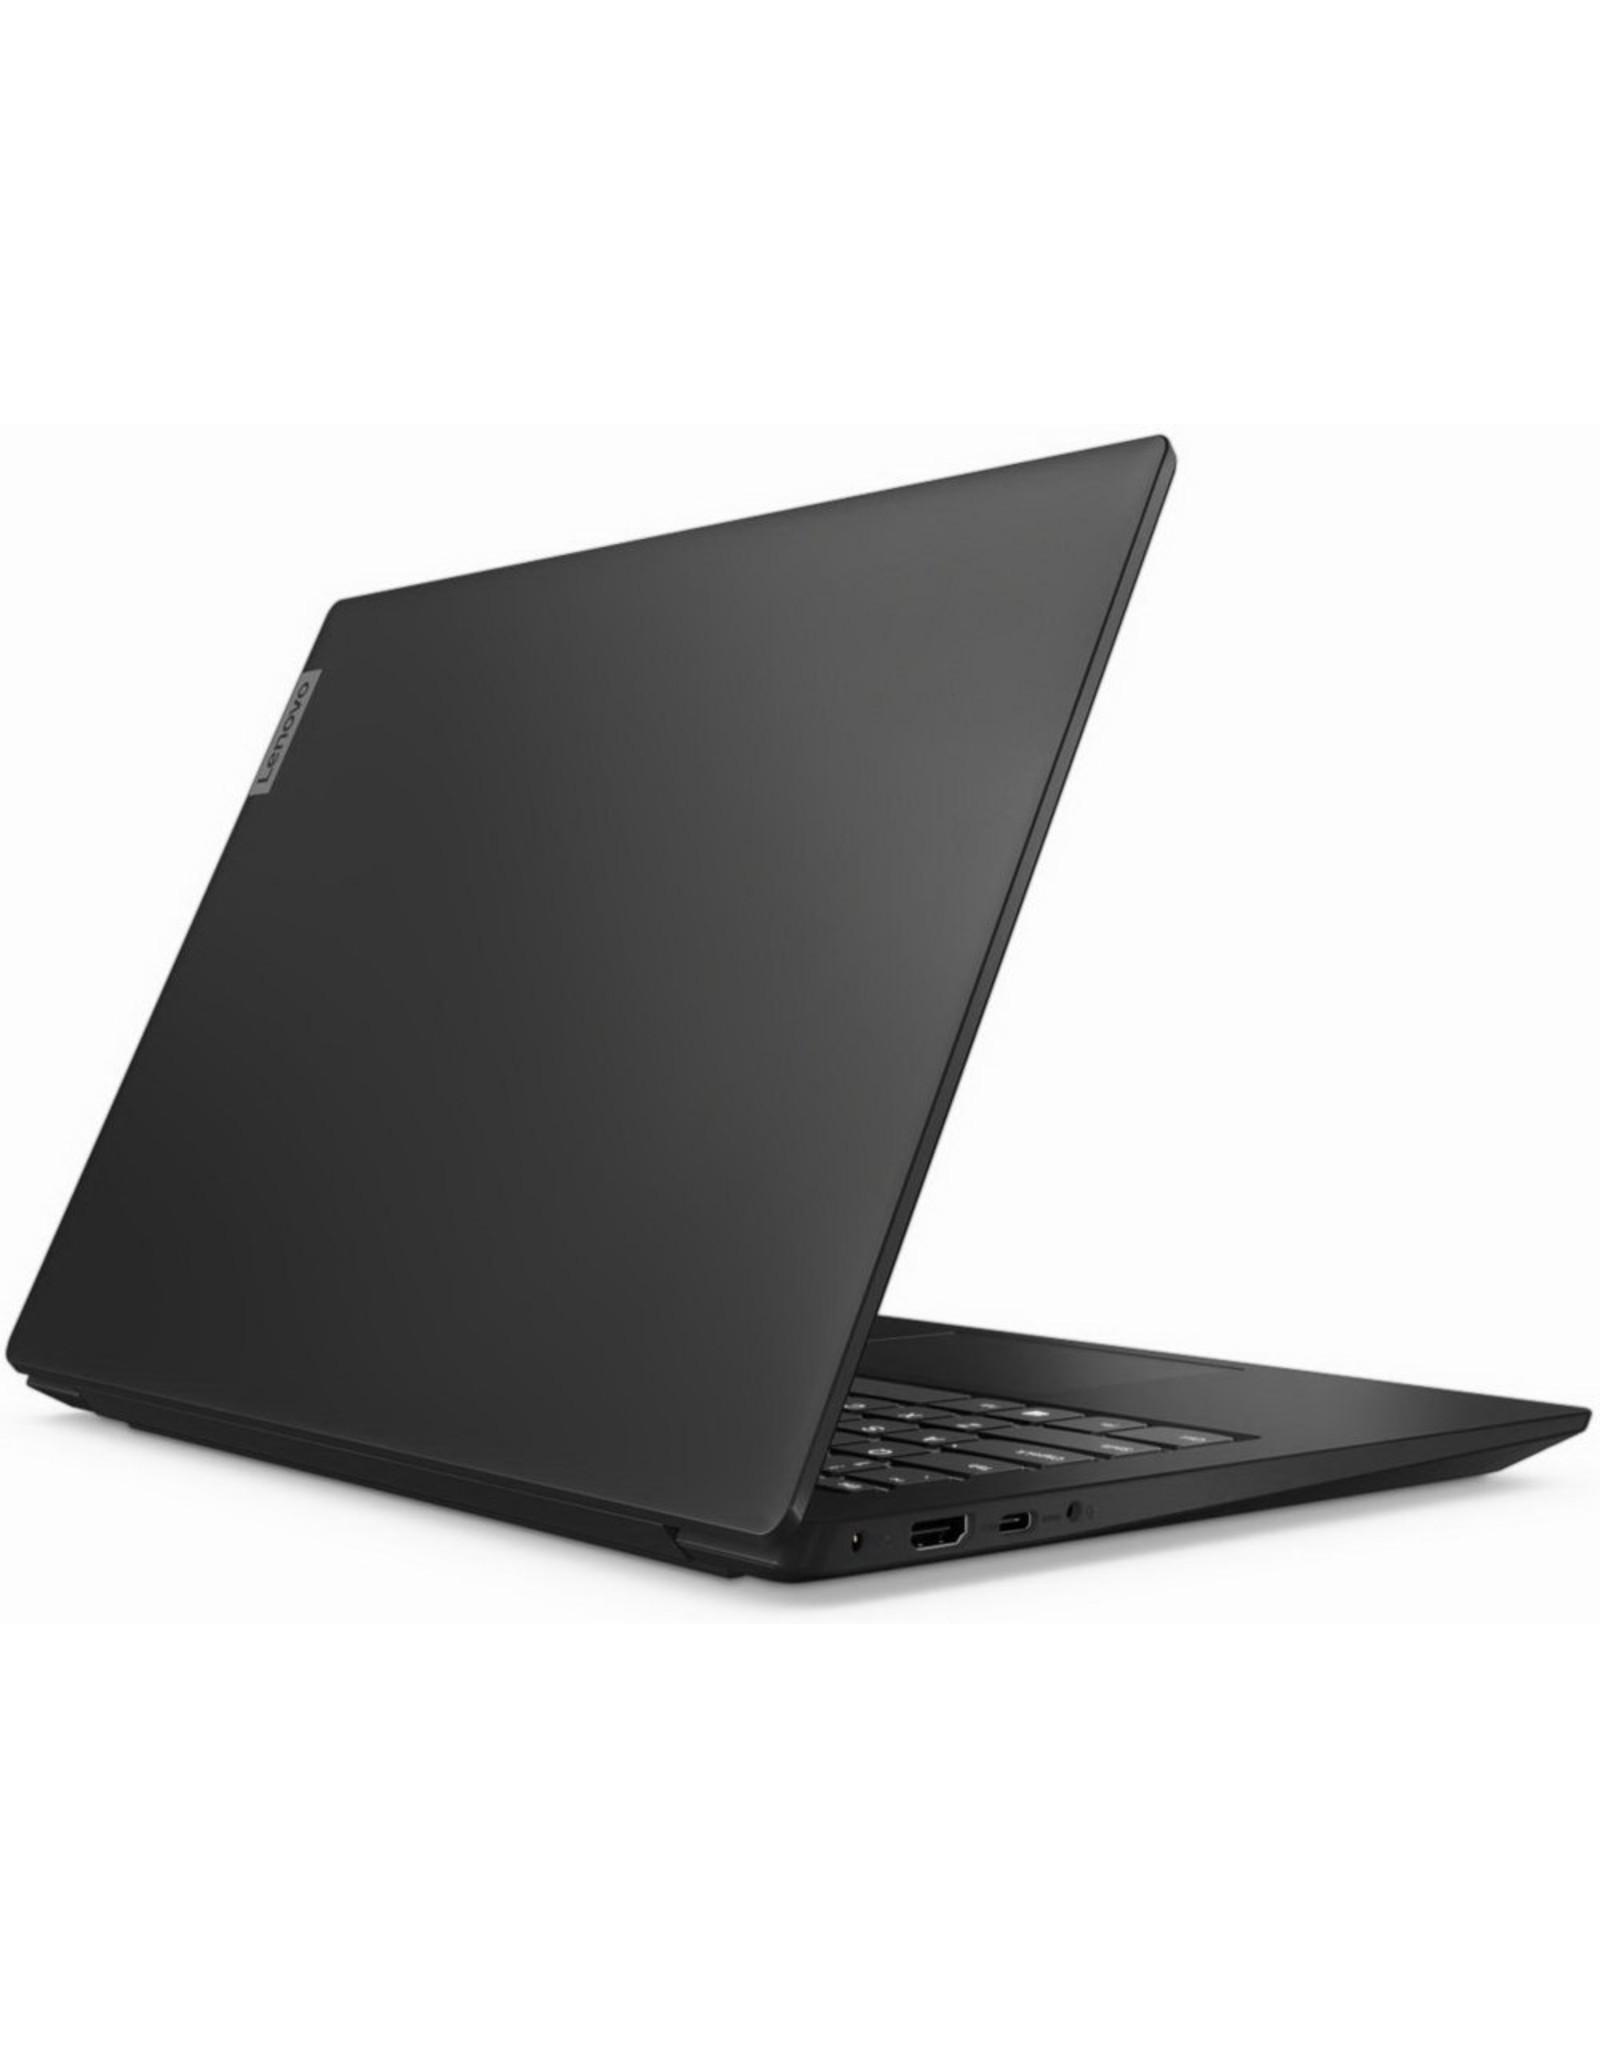 Lenovo S340 14.0 F-HD i5-8265U / 8GB / 512GB / W10